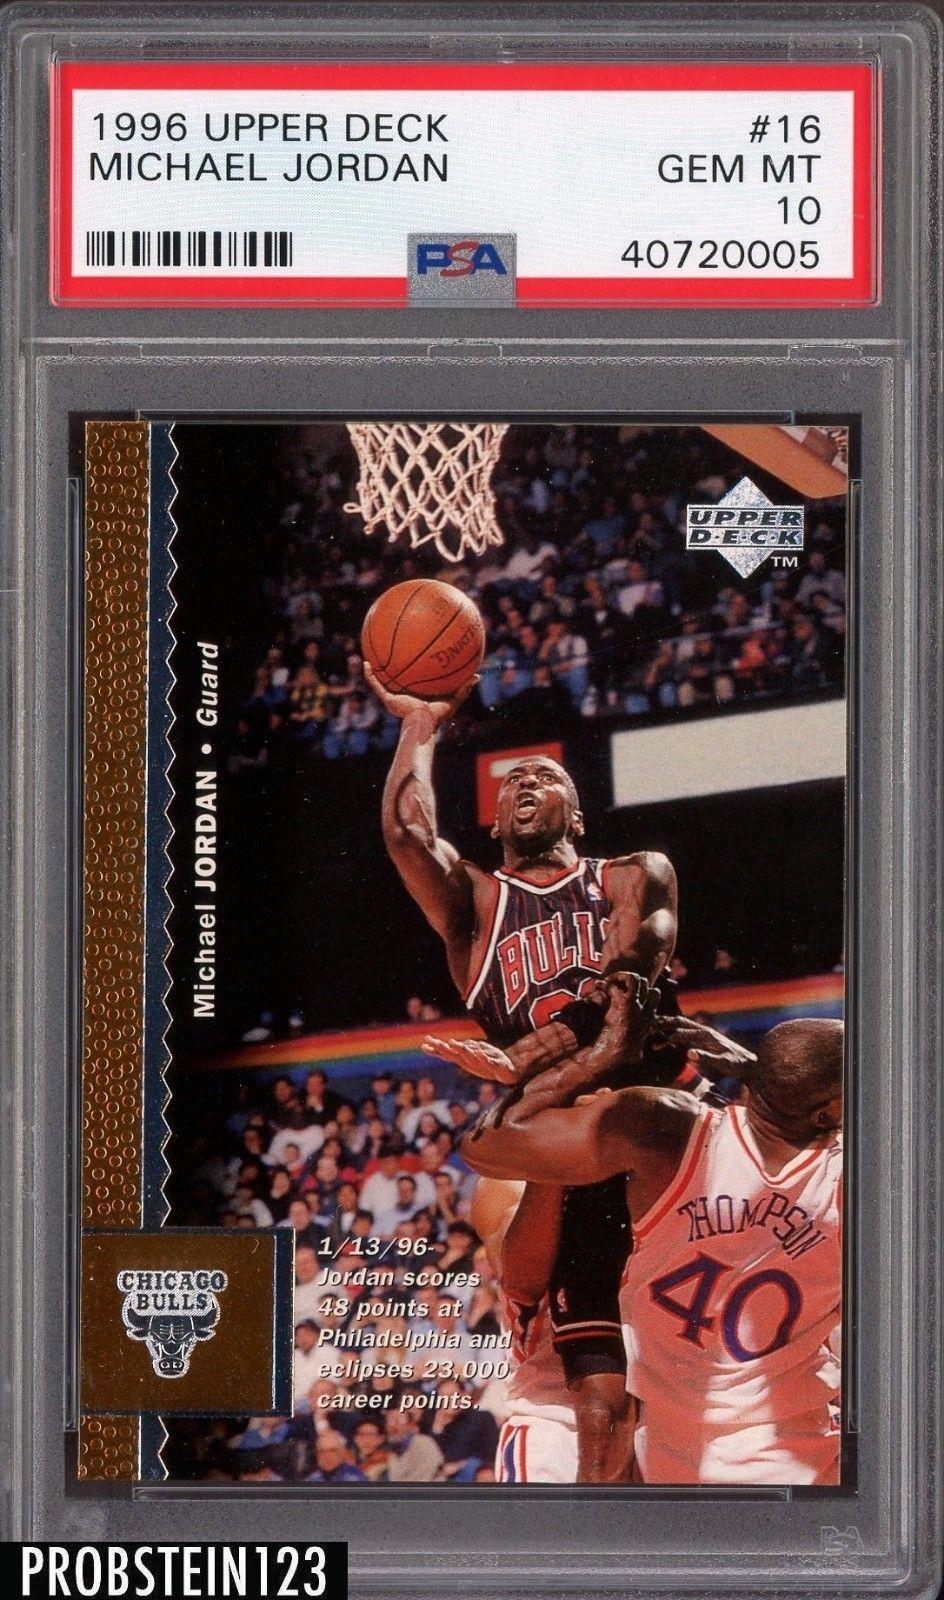 67062a72b6e712 1996 Upper Deck  16 Michael Jordan PSA 10 GEM MT  MichaelJordan